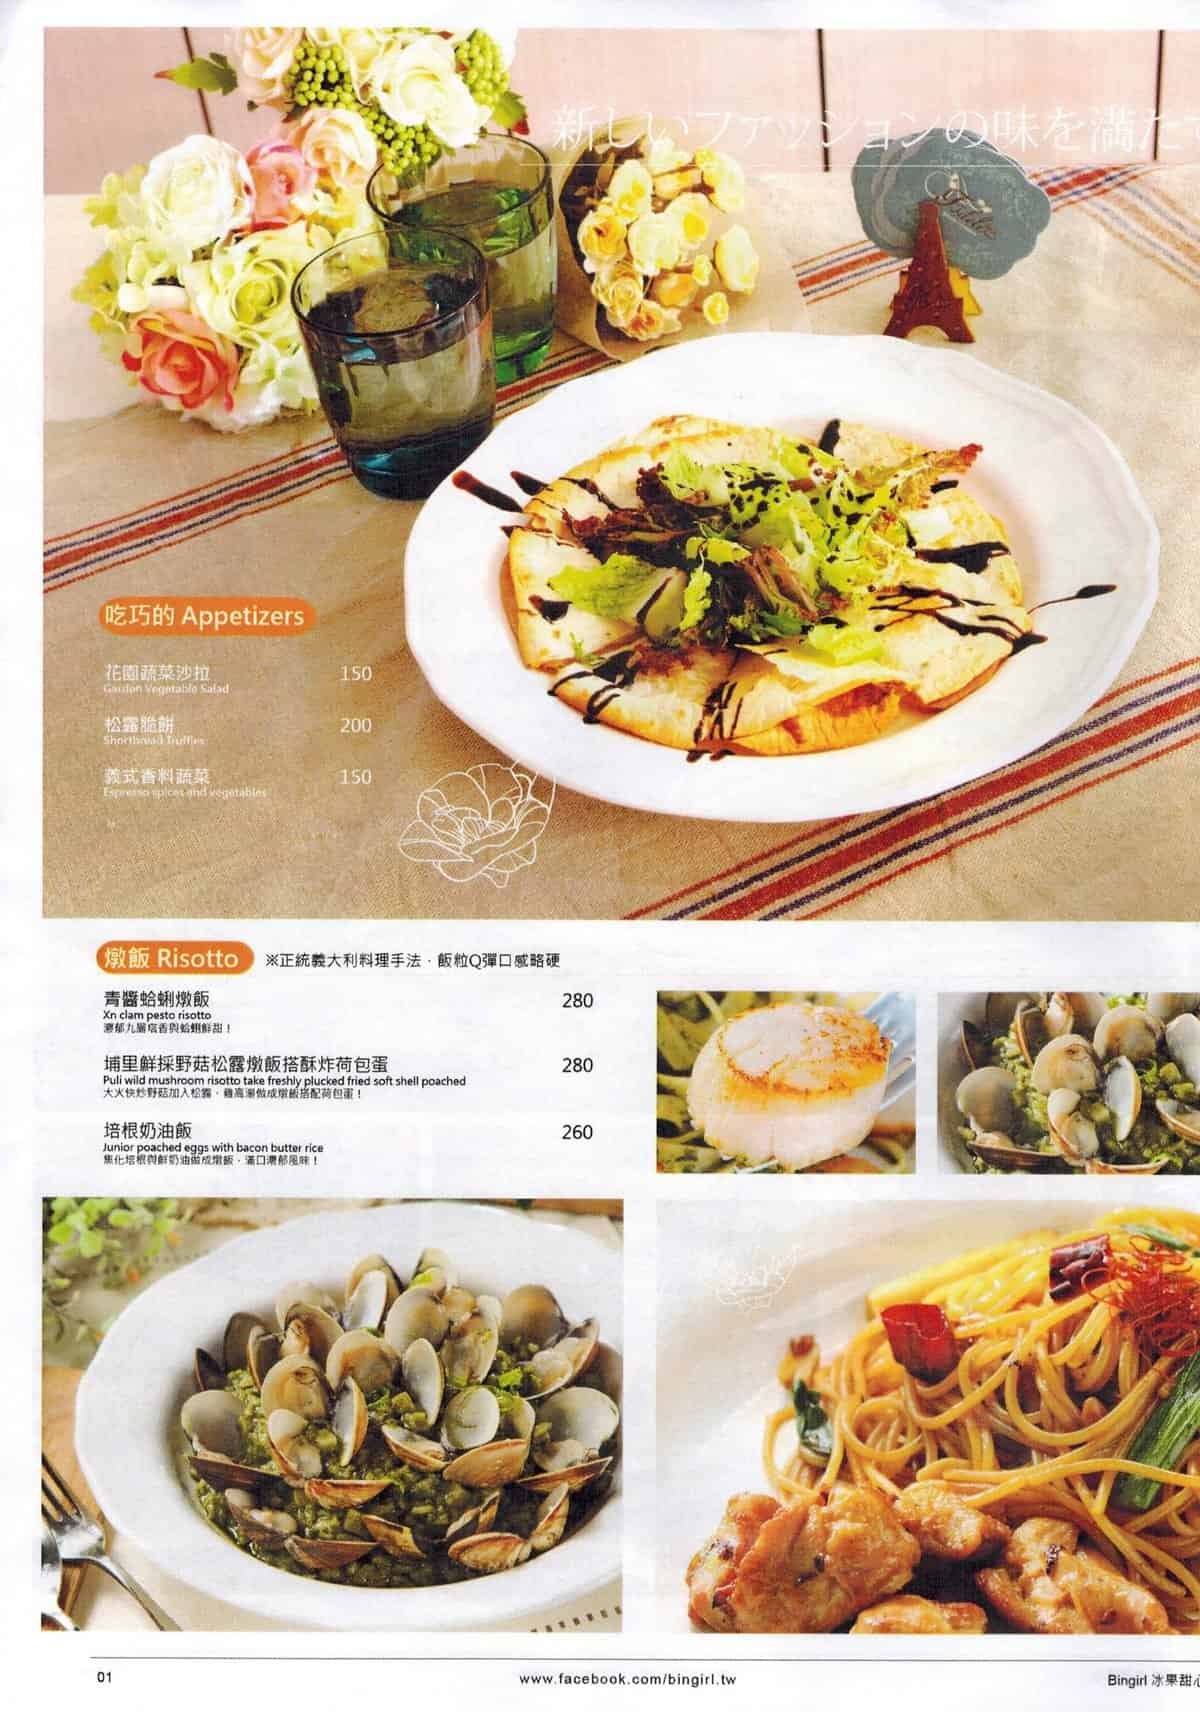 taipei-bingirl-menu2